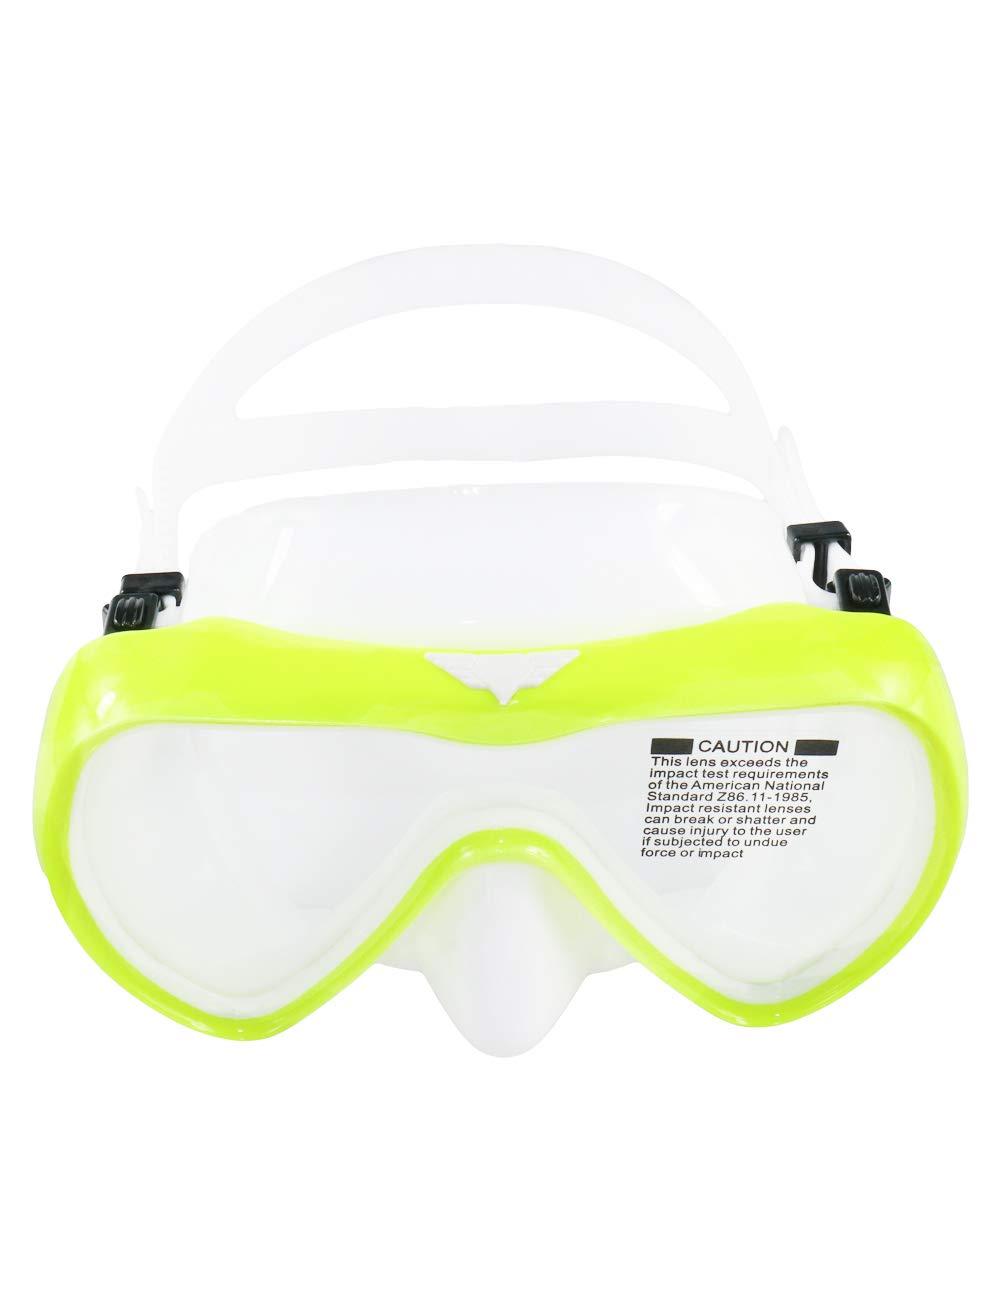 c4be4c62195 Snorkel Mask Scuba Dive Mask Glasses Snorkeling Gear Silicone Diving Goggles  Kit Impact Resistance Anti-leak ...